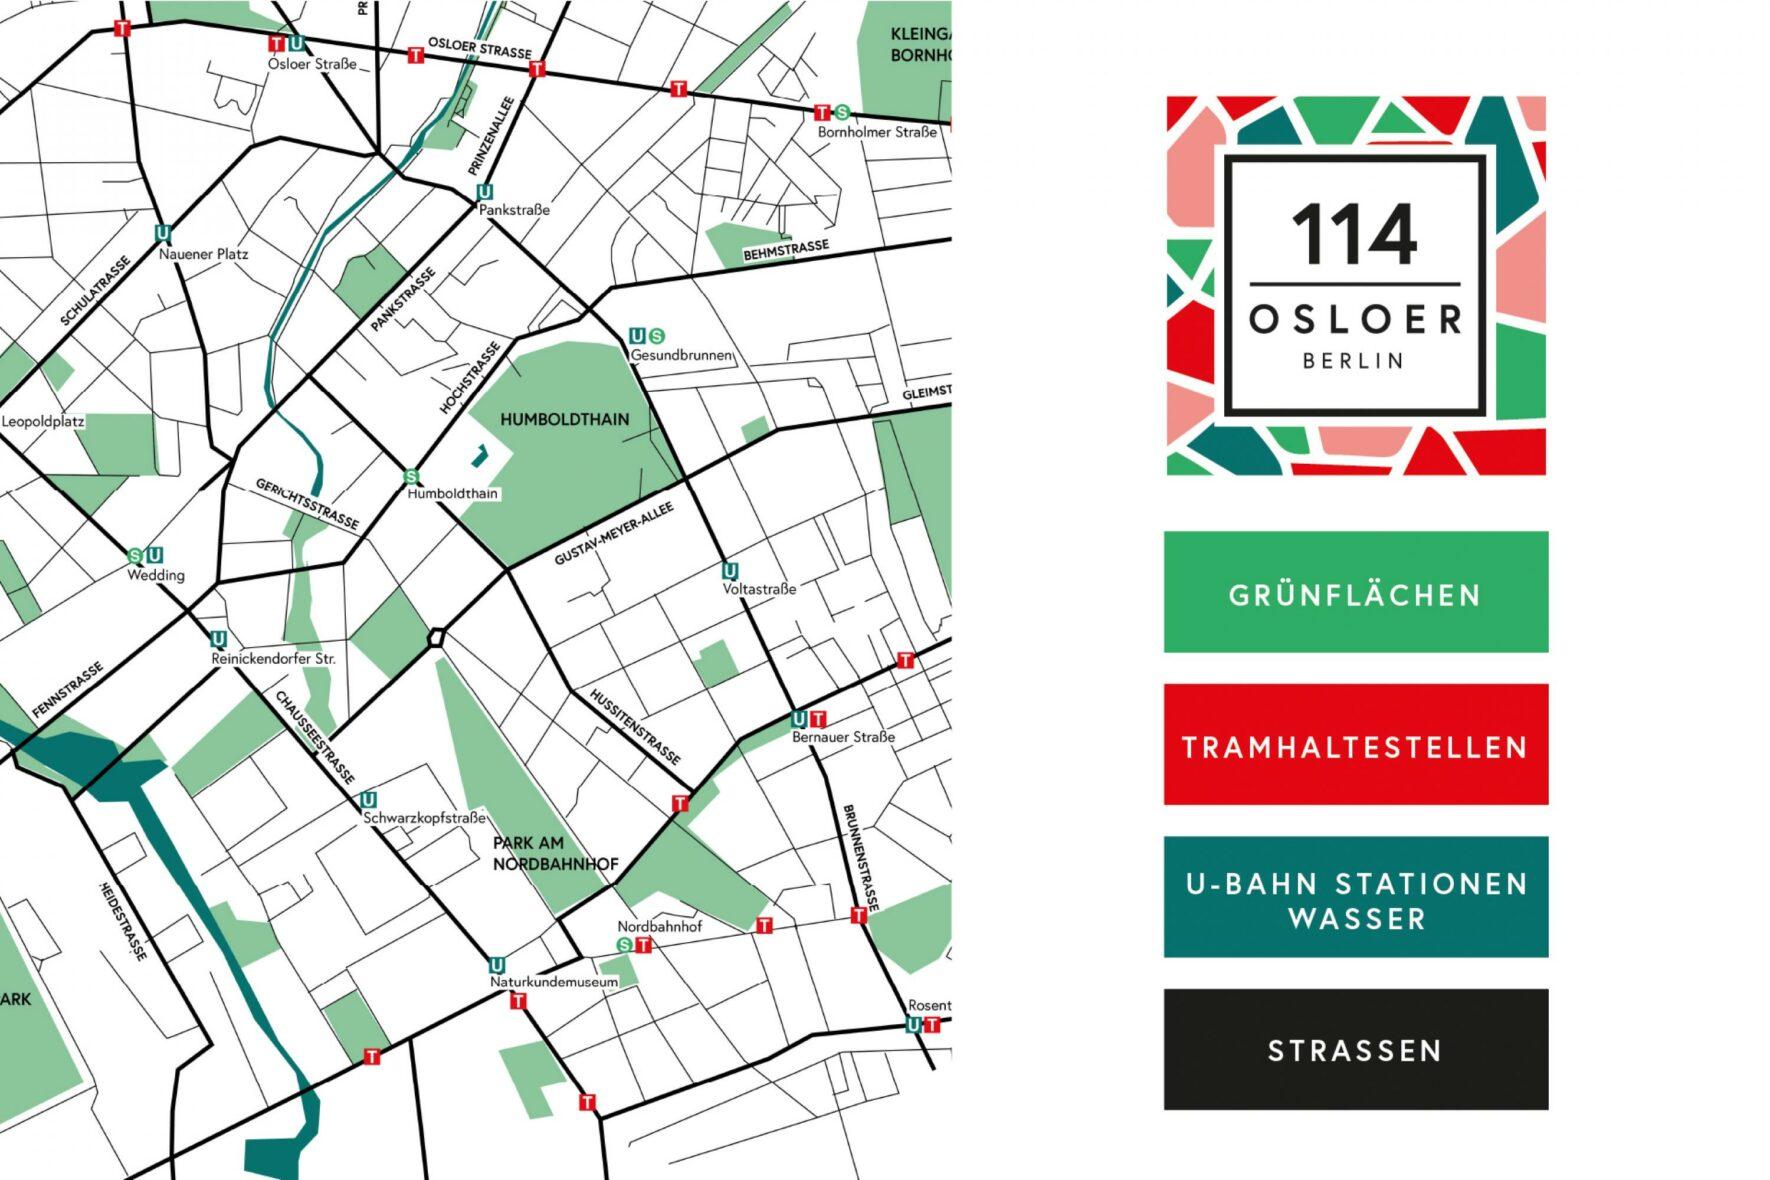 Osloer114-Map-Stadtkarte-Design-FORMLOS-Berlin-Gestaltung